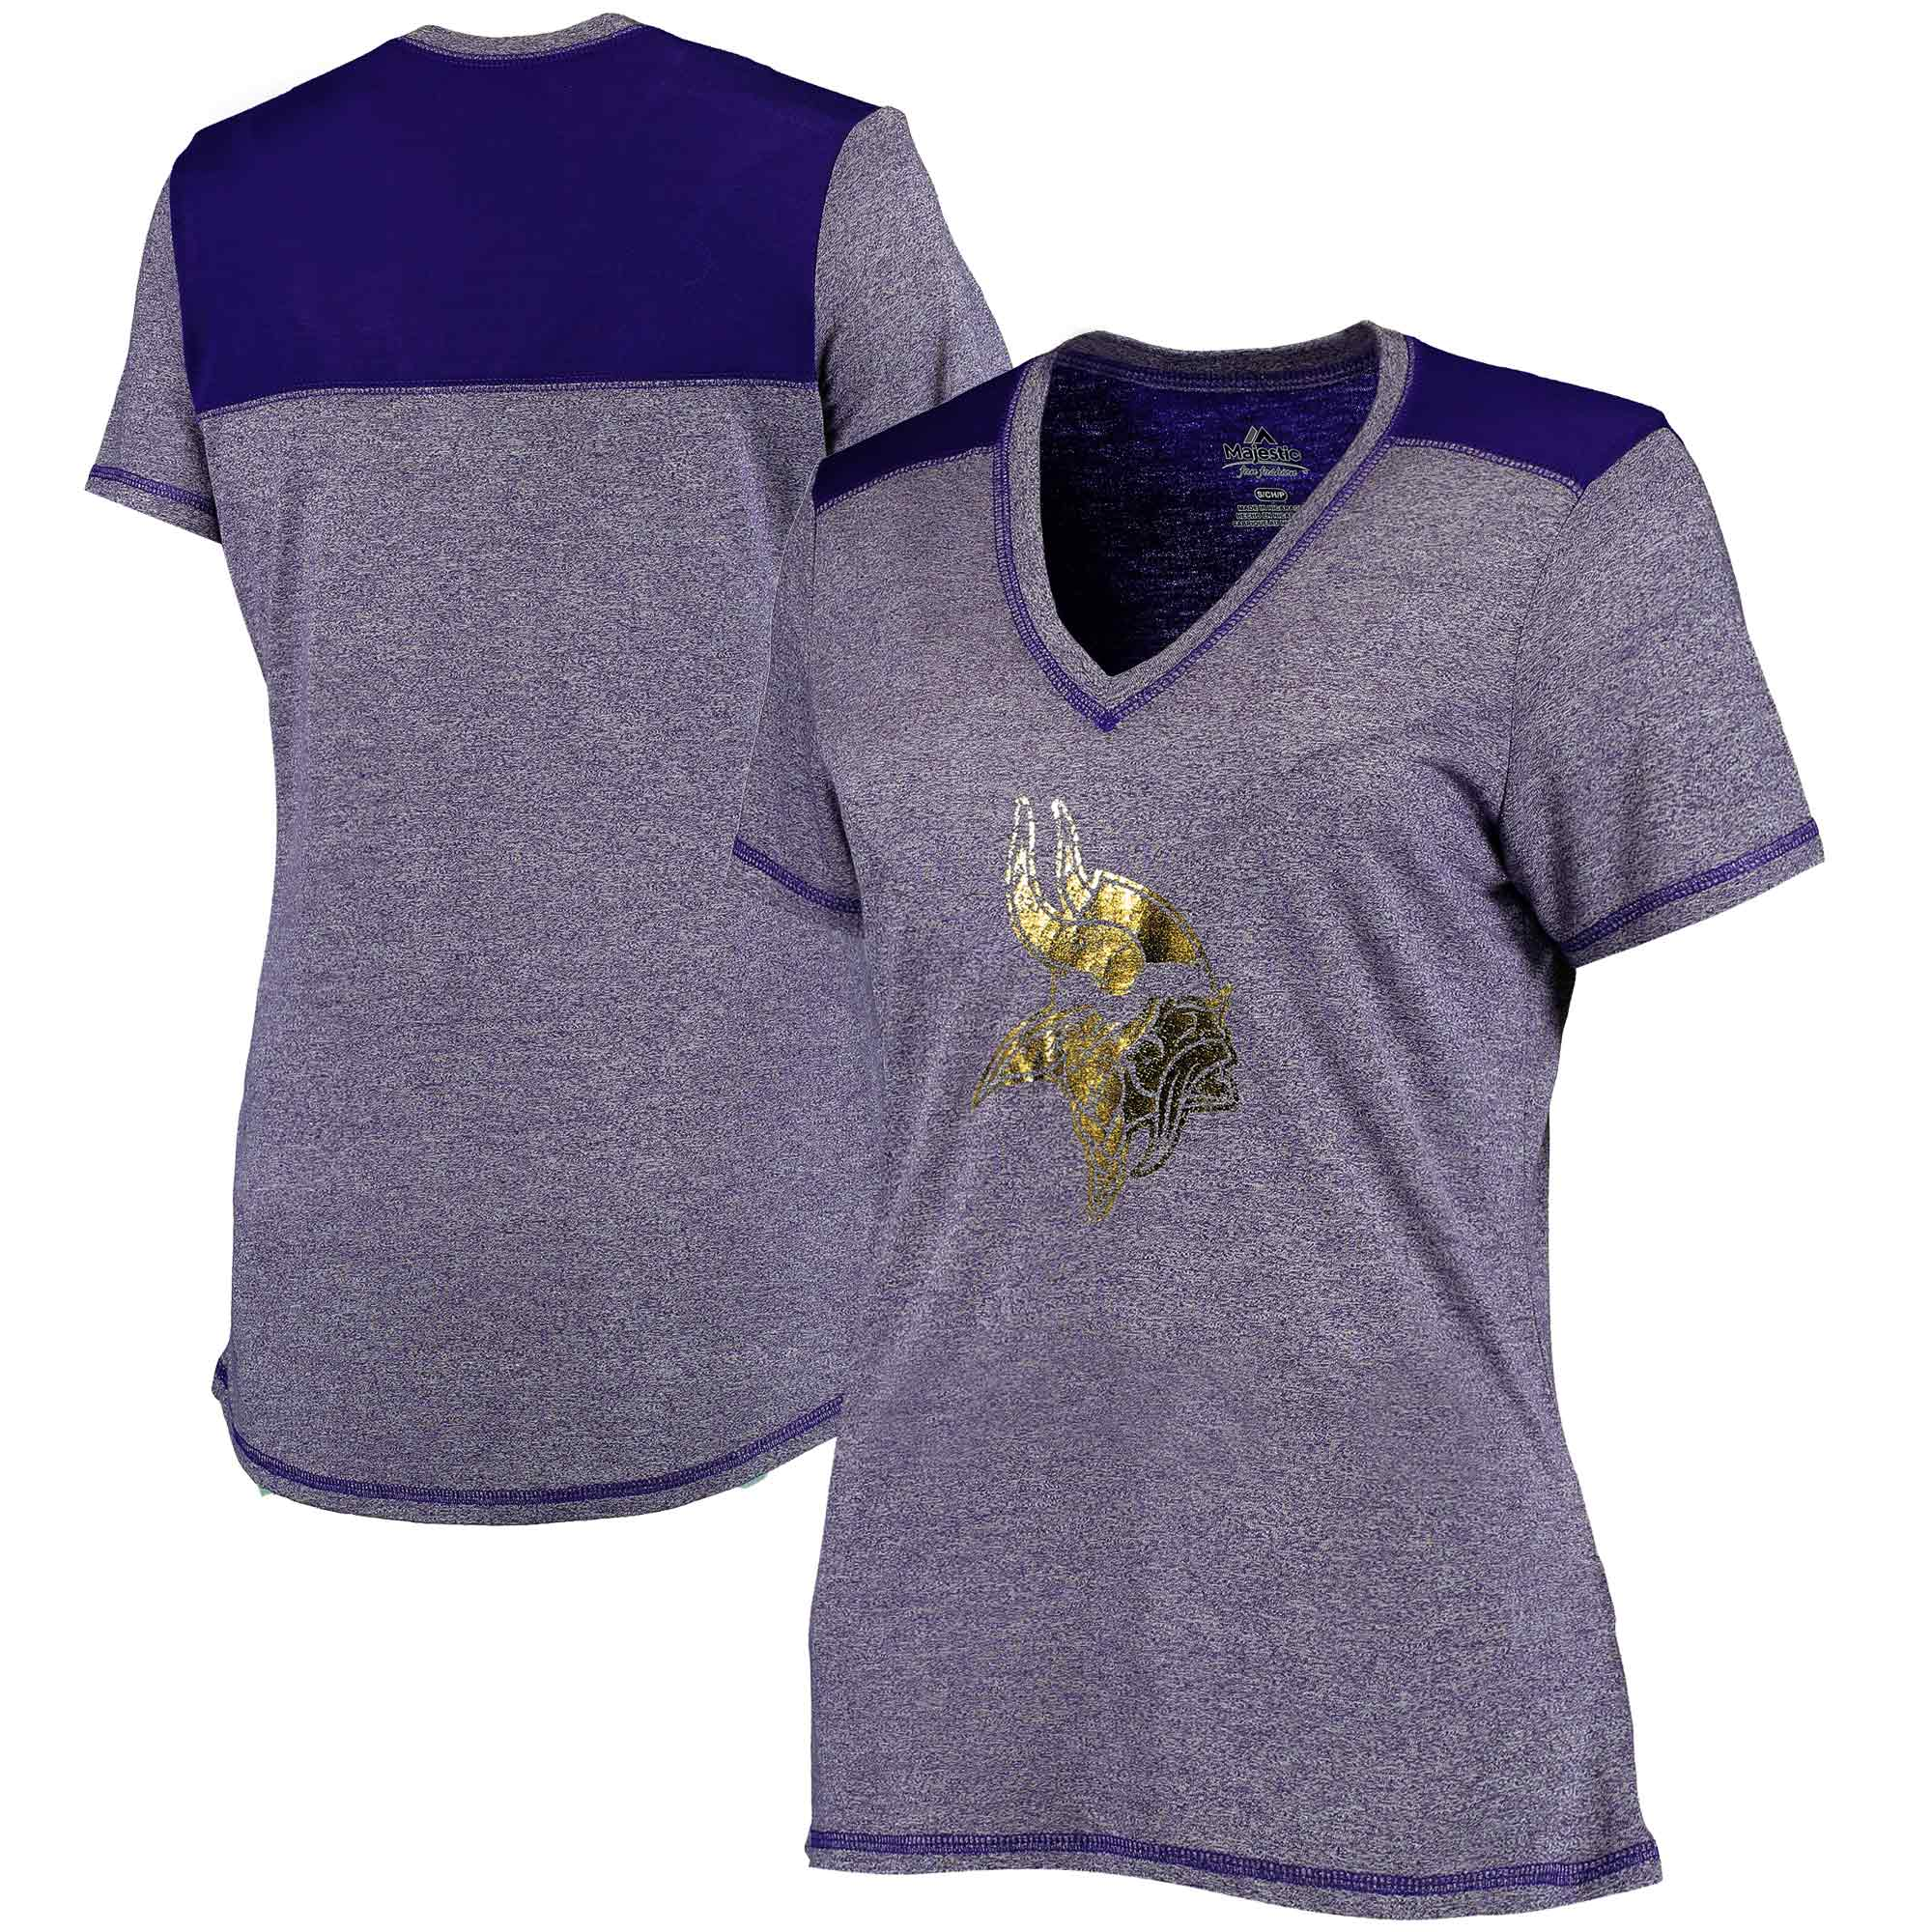 Minnesota Vikings Majestic Women's Bright Lights V-Neck T-Shirt - Heathered Purple